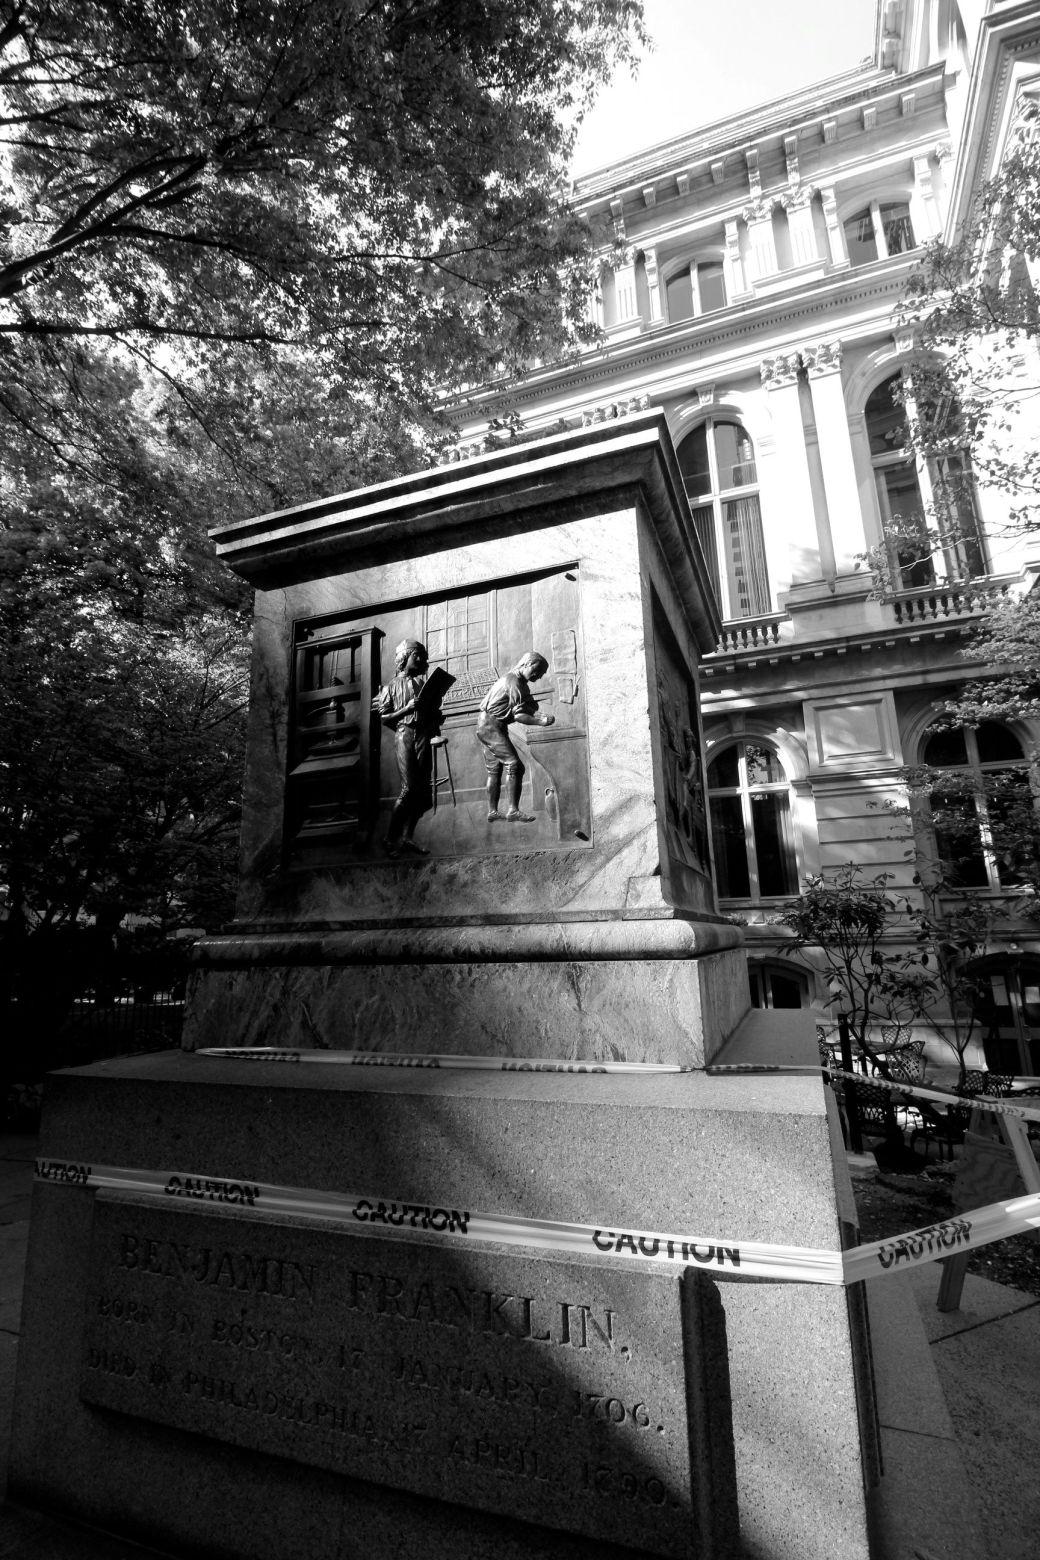 boston downtown crossing missing benjamin franklin statue